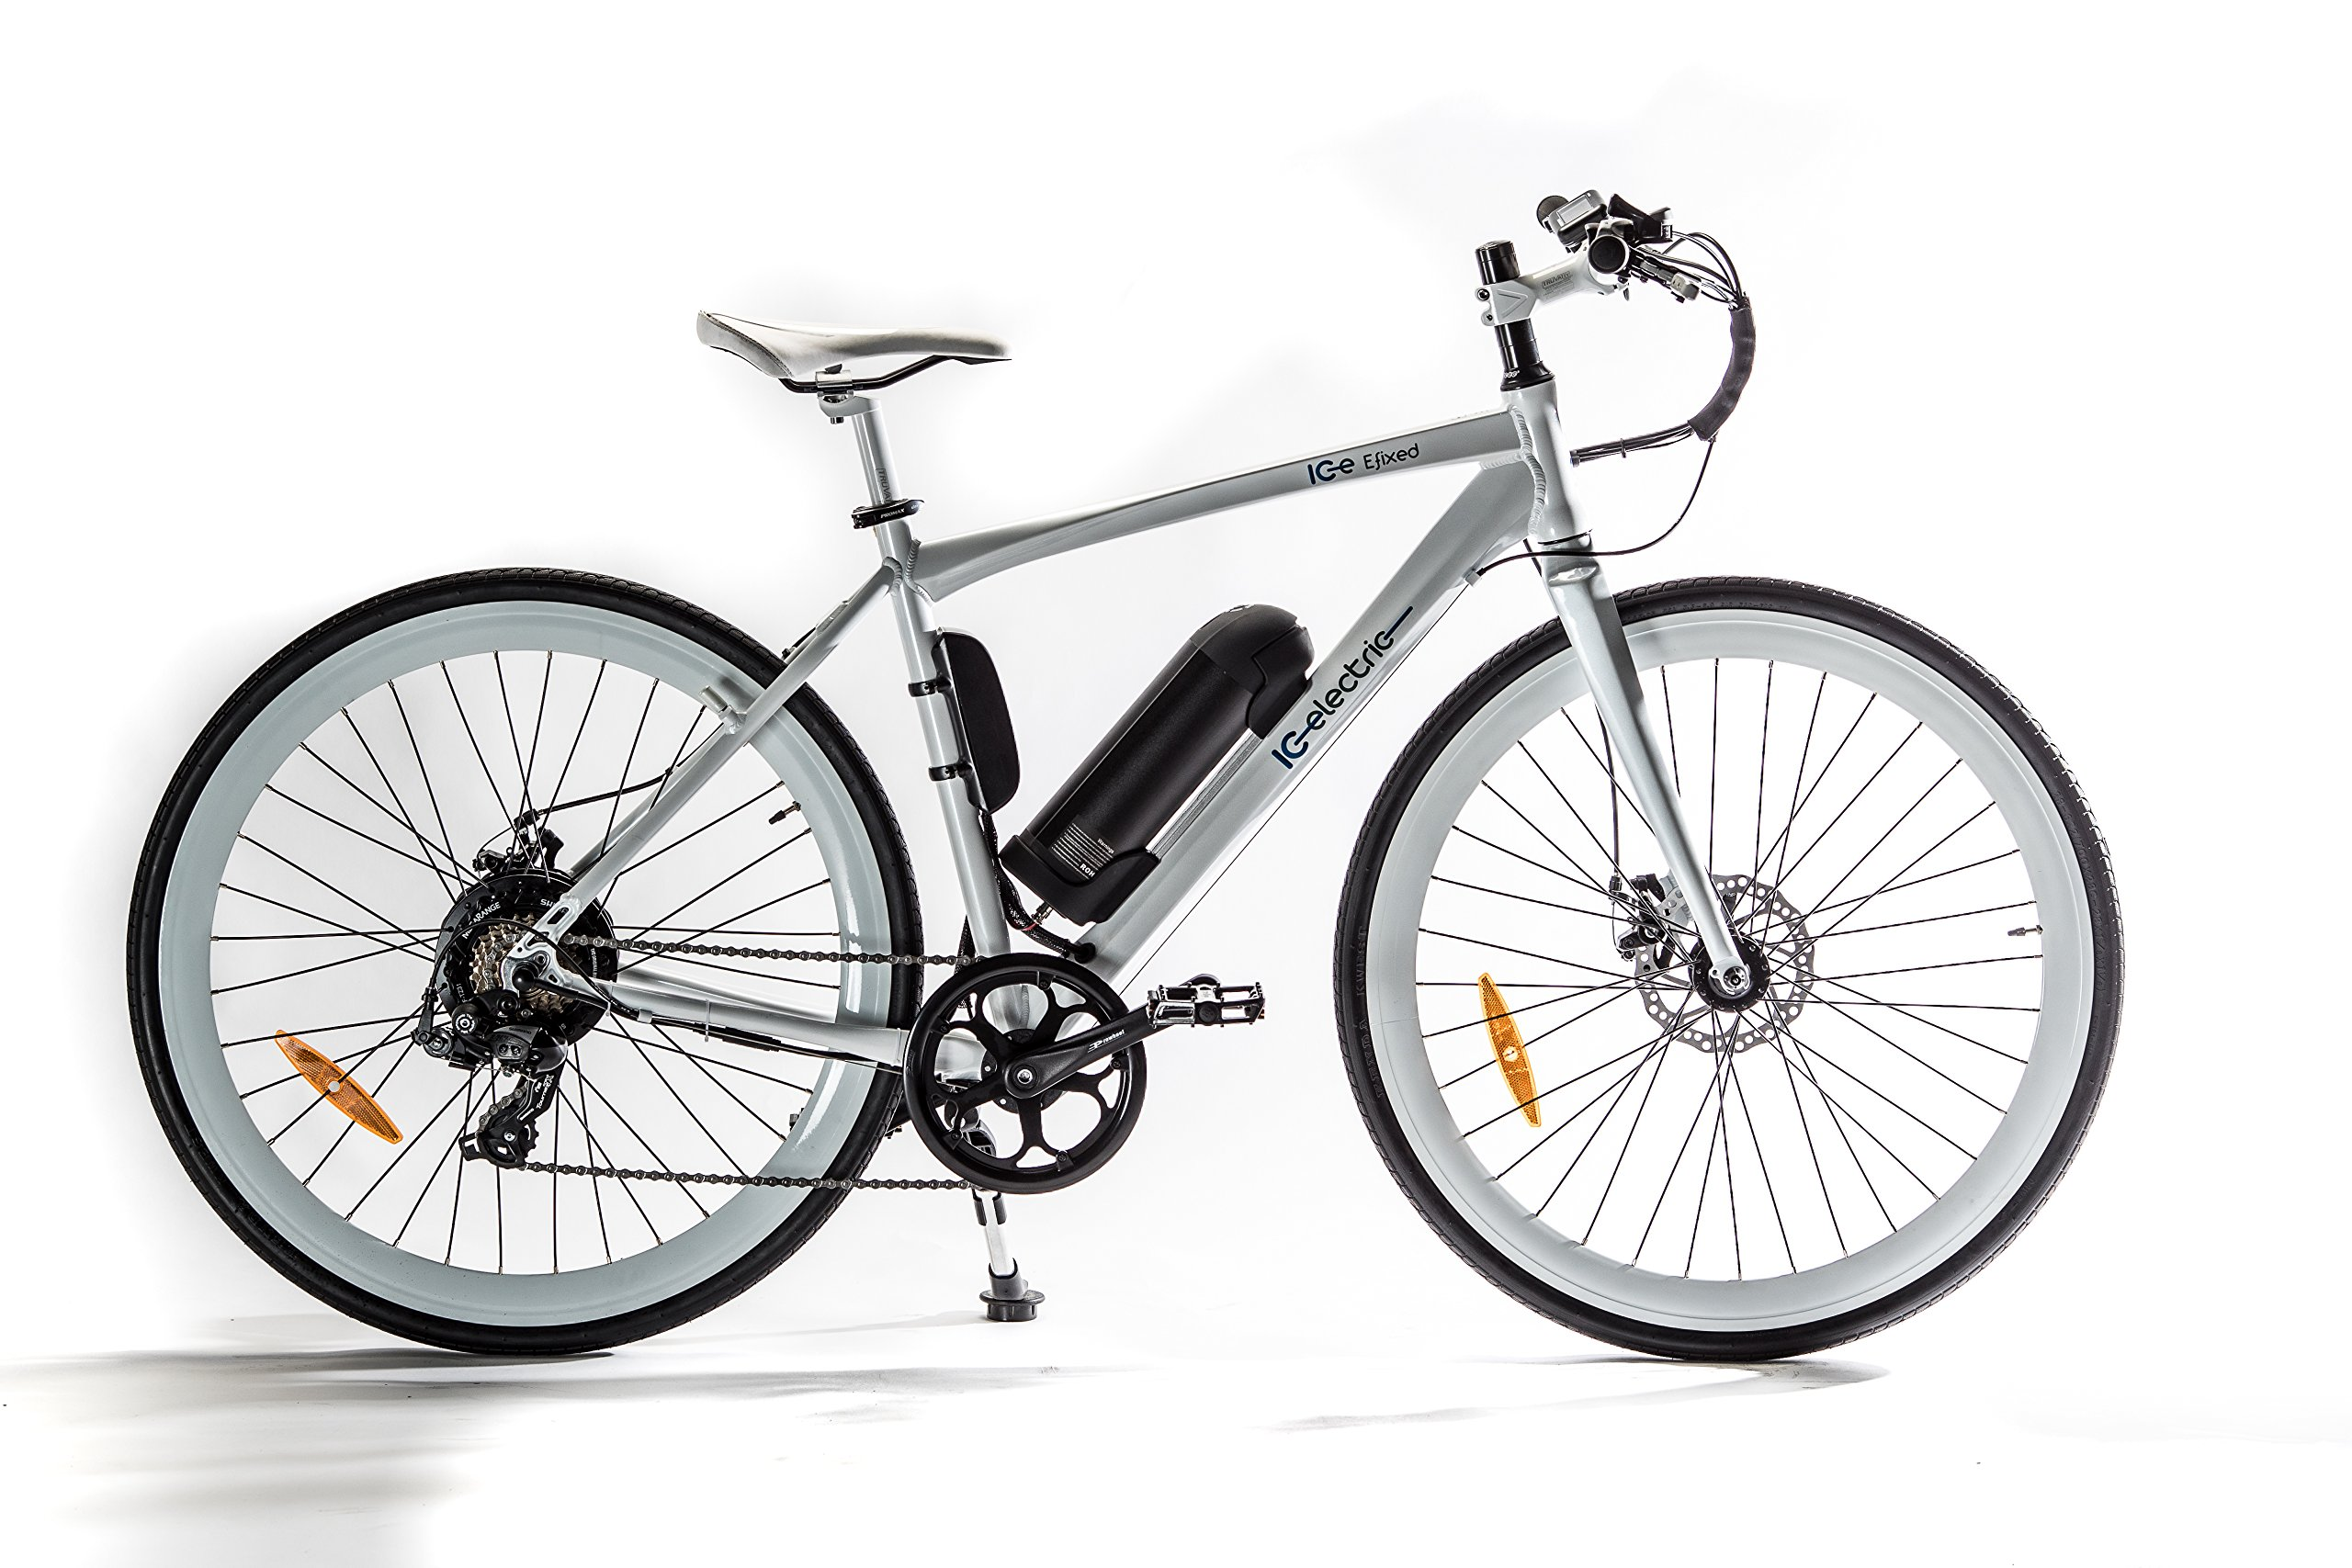 Bicicleta eléctrica Efixed de IC Electric